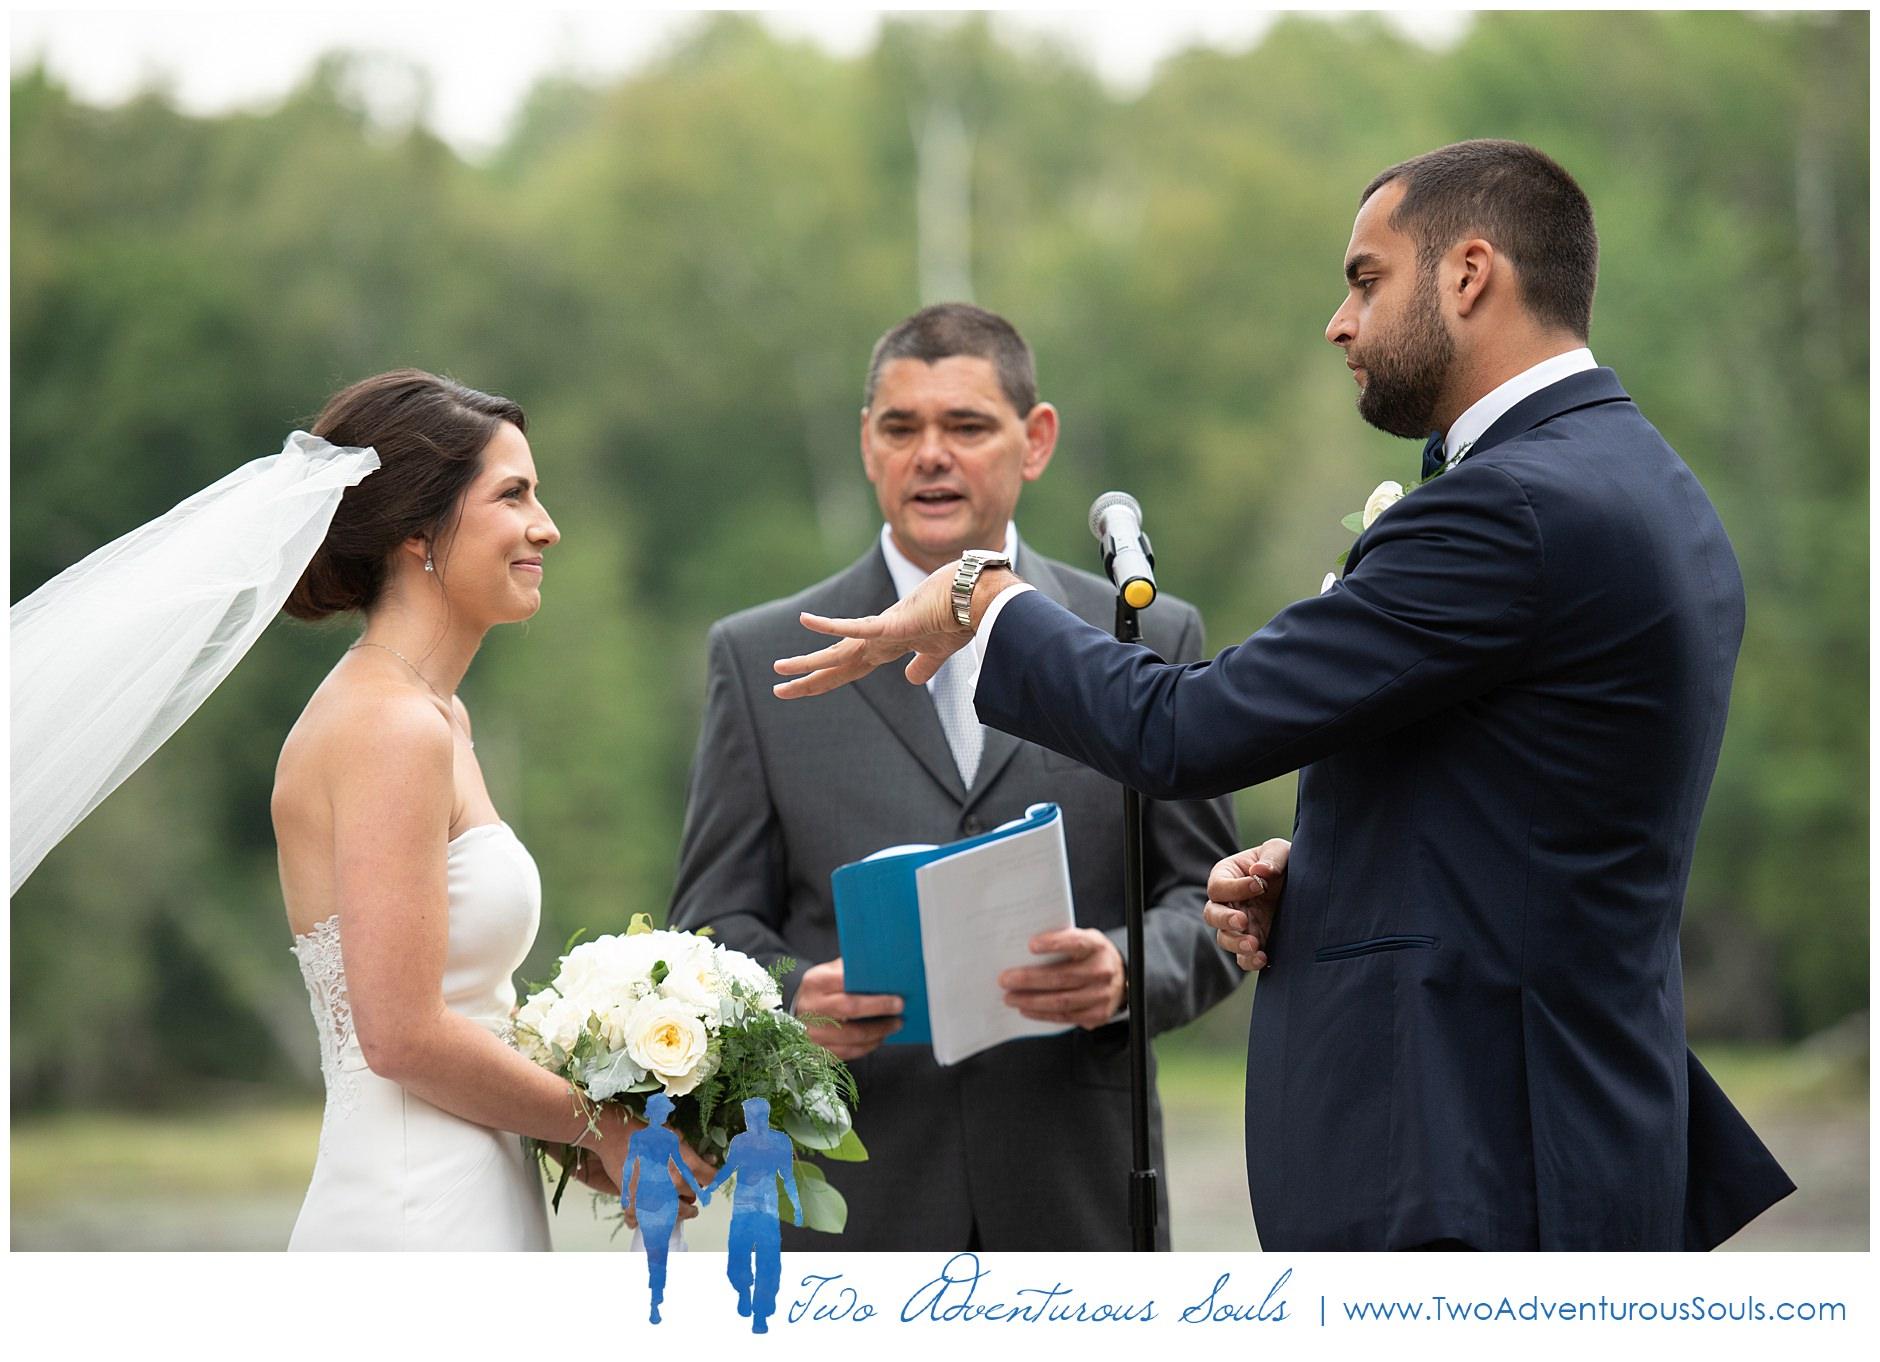 Sugarloaf Outdoor Center Wedding Photographers, Destination Wedding Photographers, Two Adventurous Souls-081719_0041.jpg